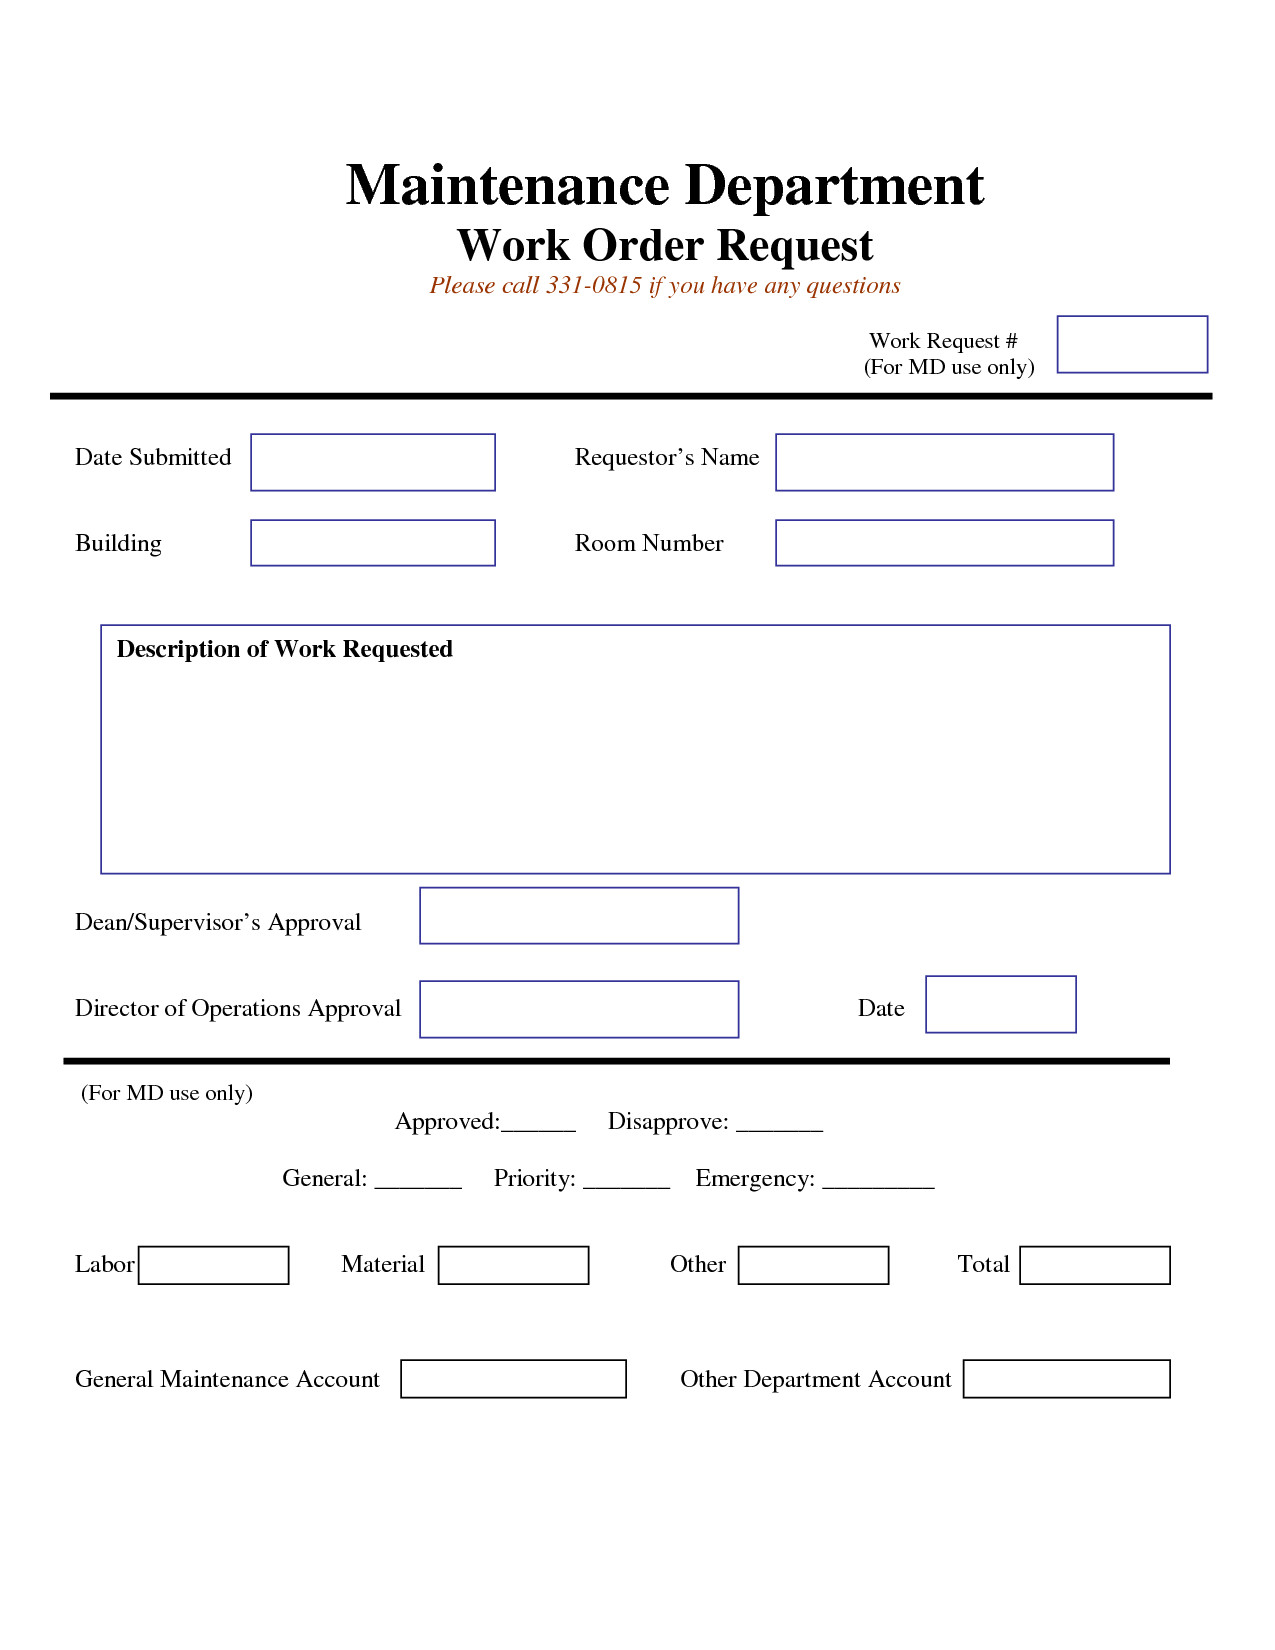 Maintenance Request form Template Work Request form